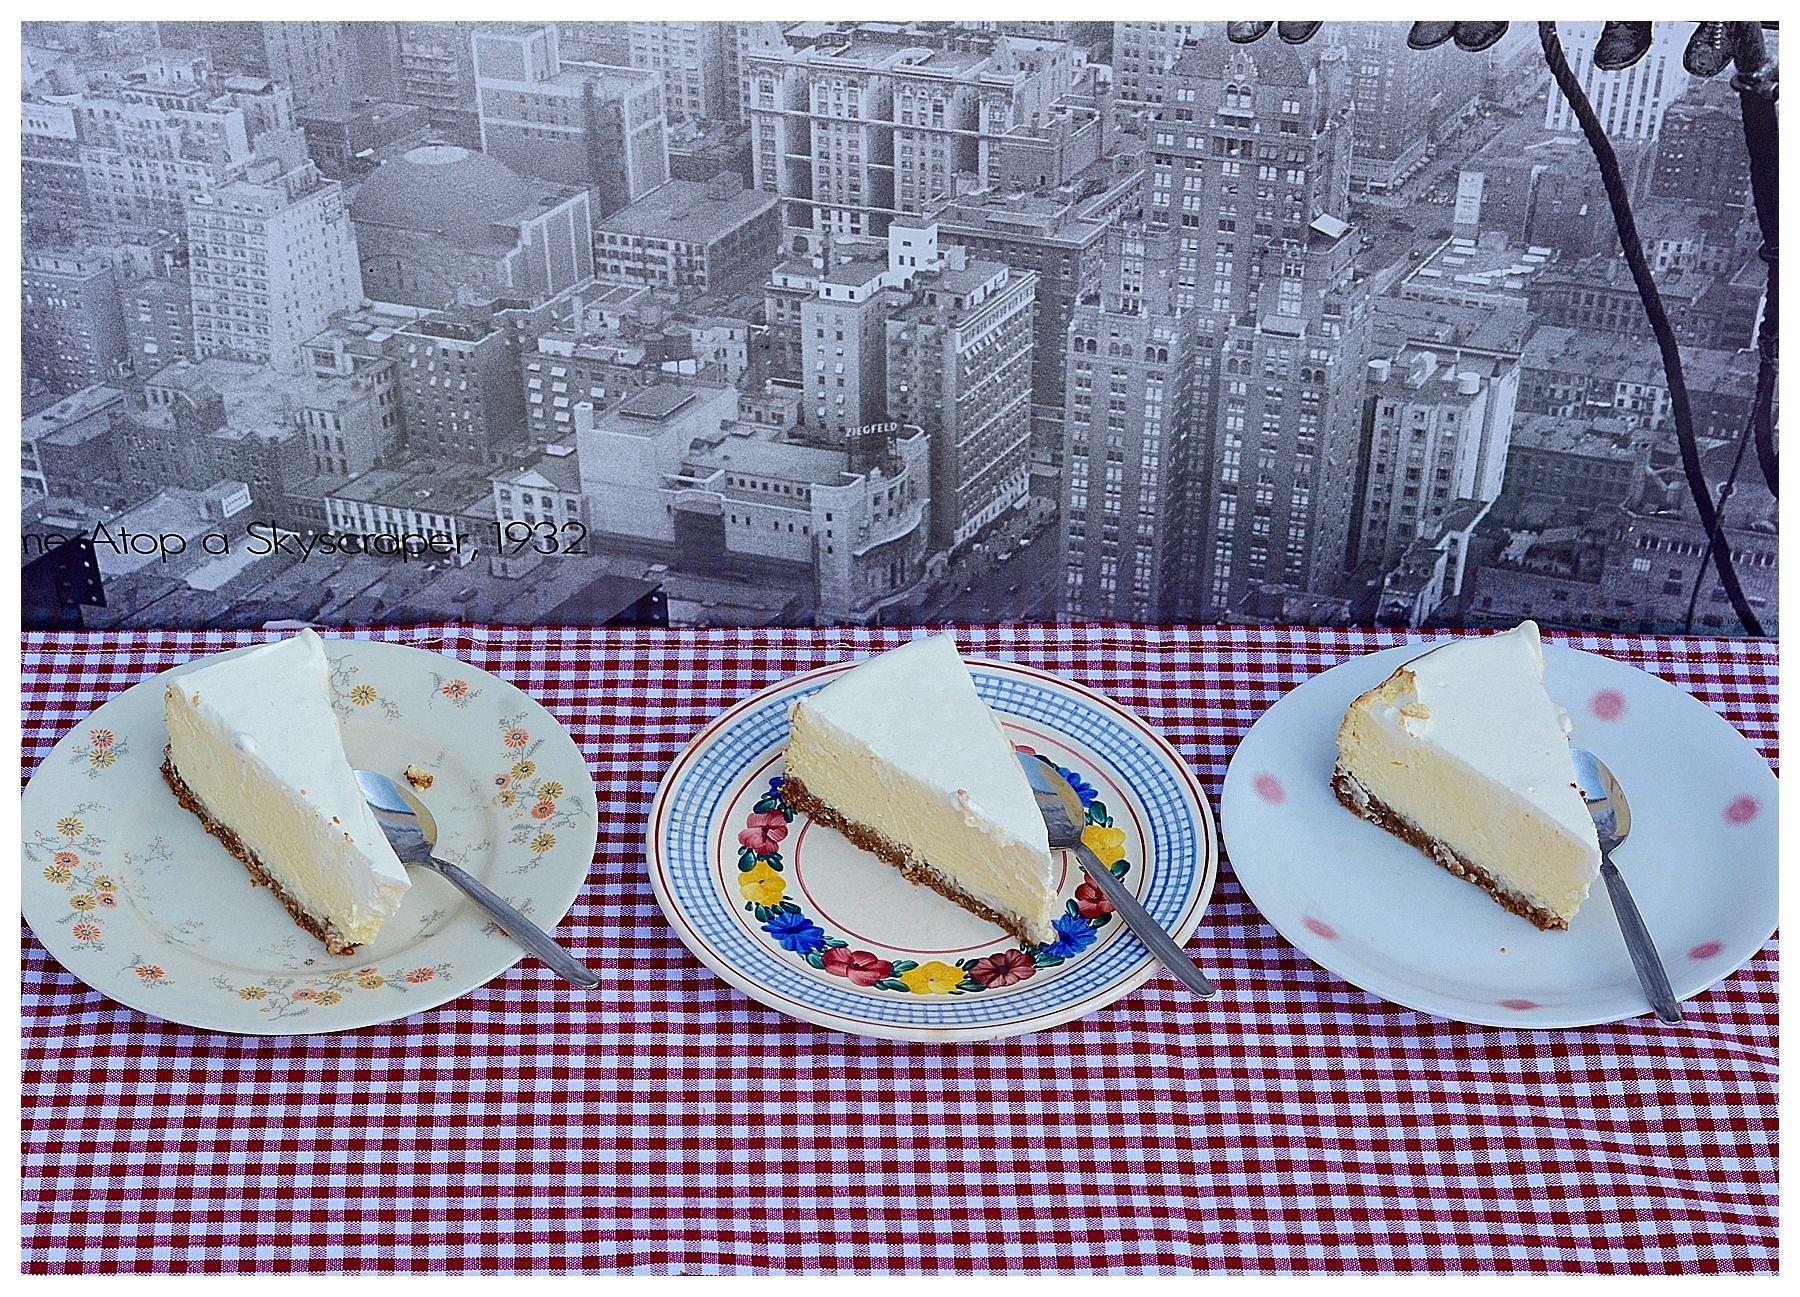 Hofer badezimmerschrank ~ New york cheesecake recipe ny style and cheesecakes